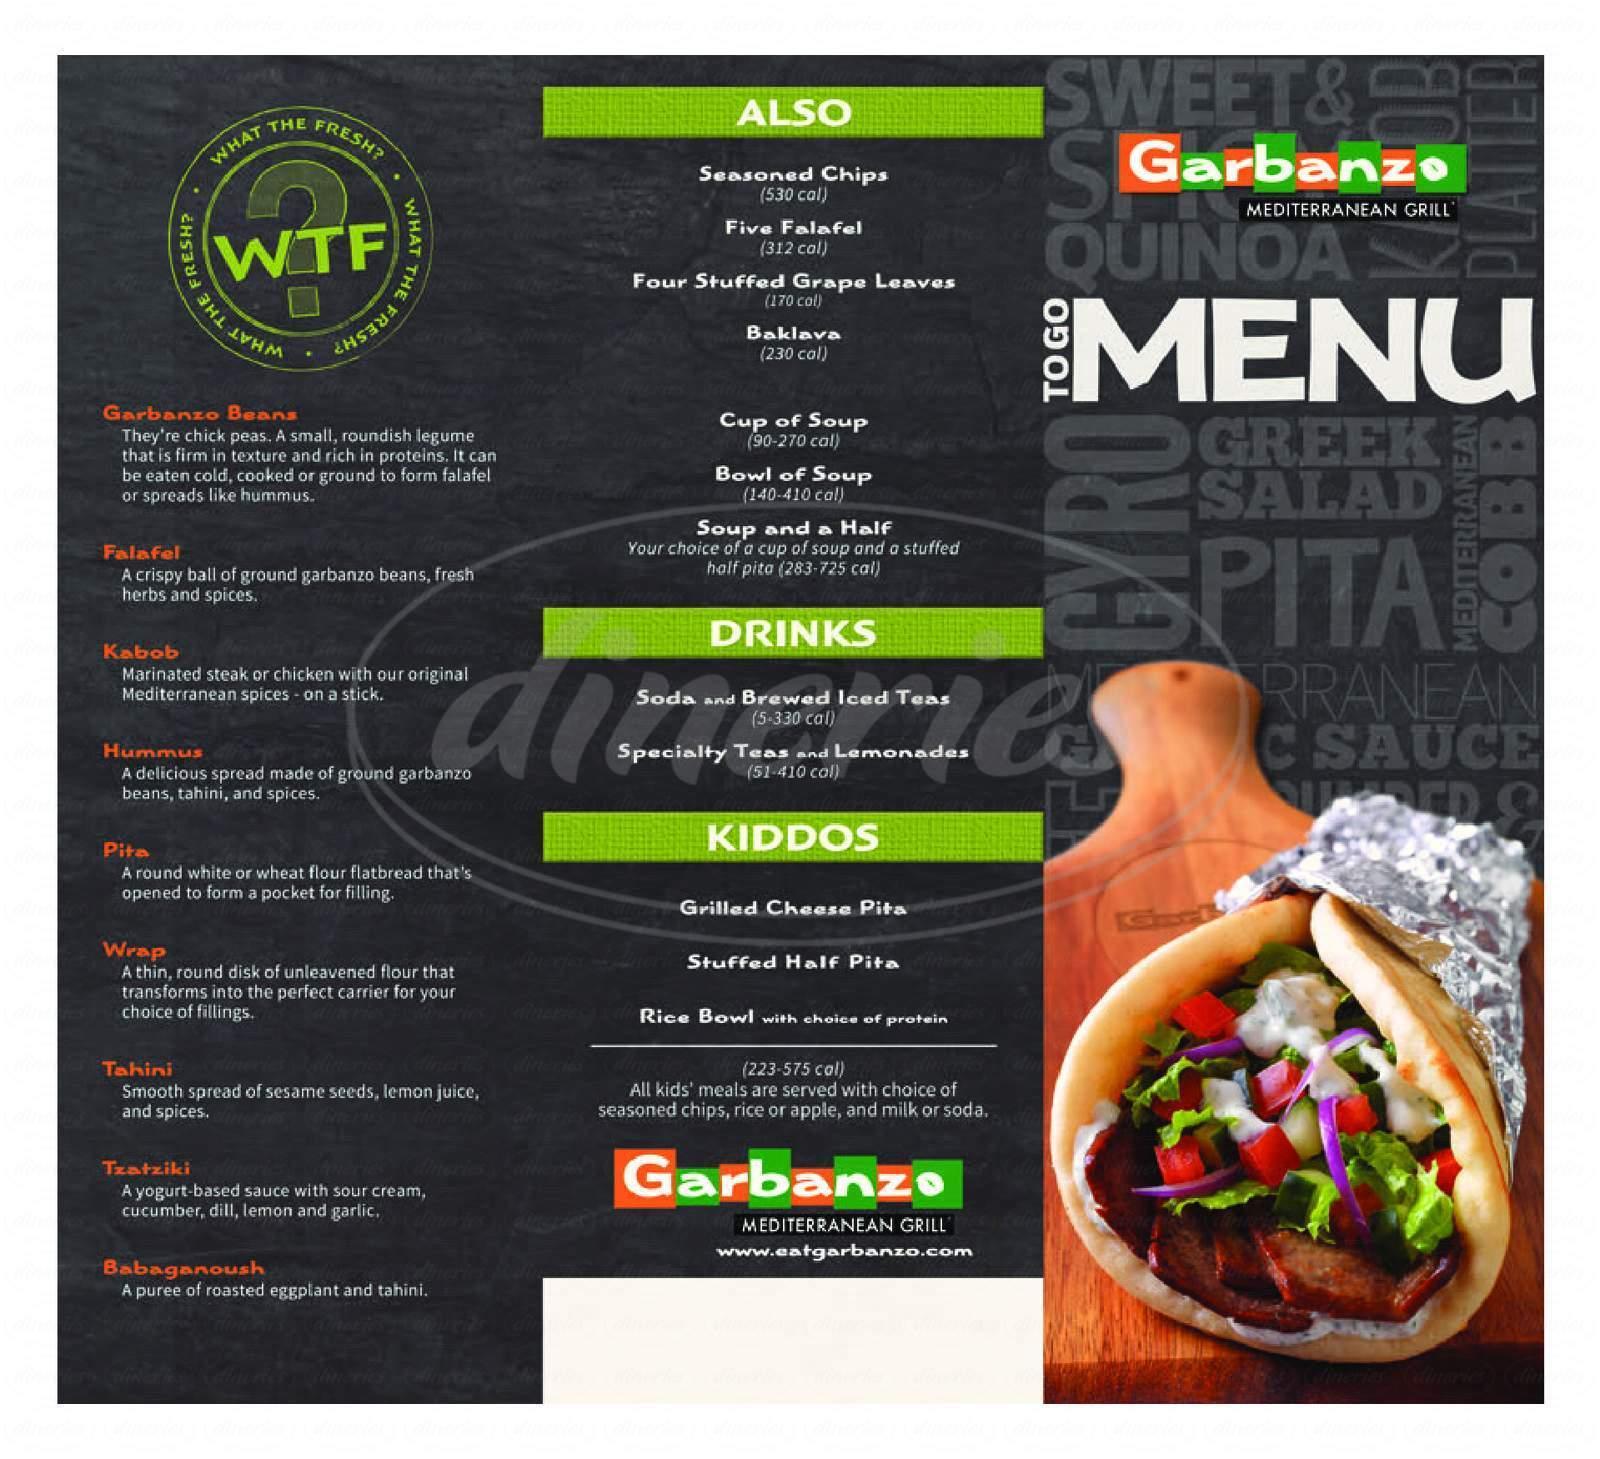 menu for Garbanzo Mediterranean Grille